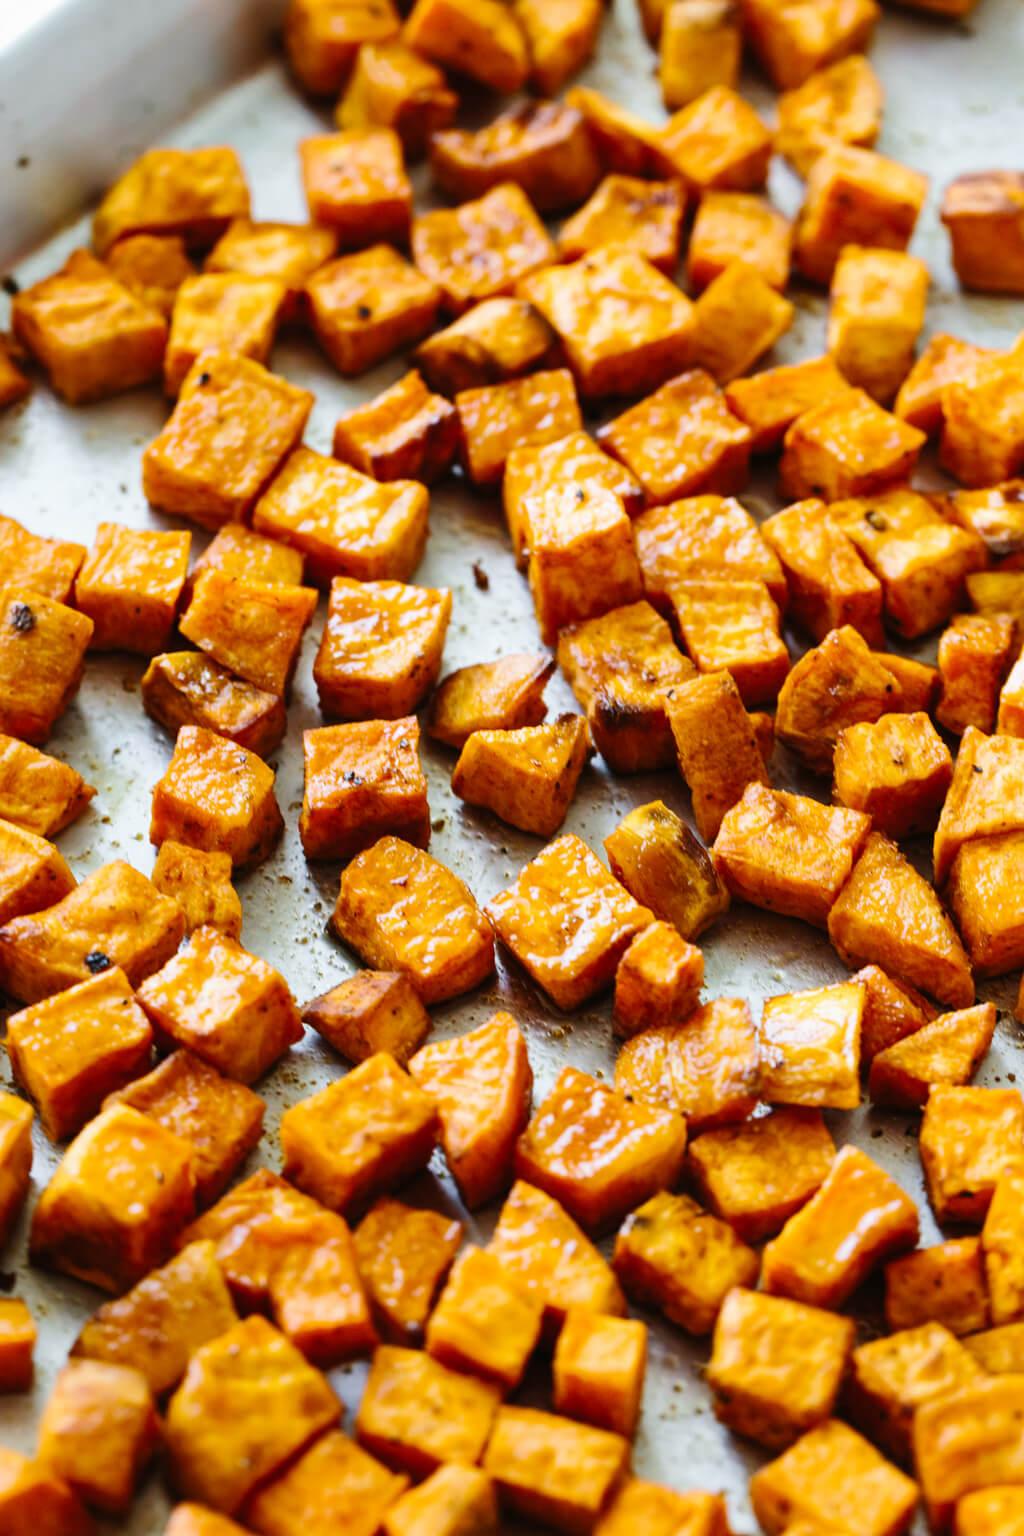 Roasted sweet potatoes on a sheet pan.